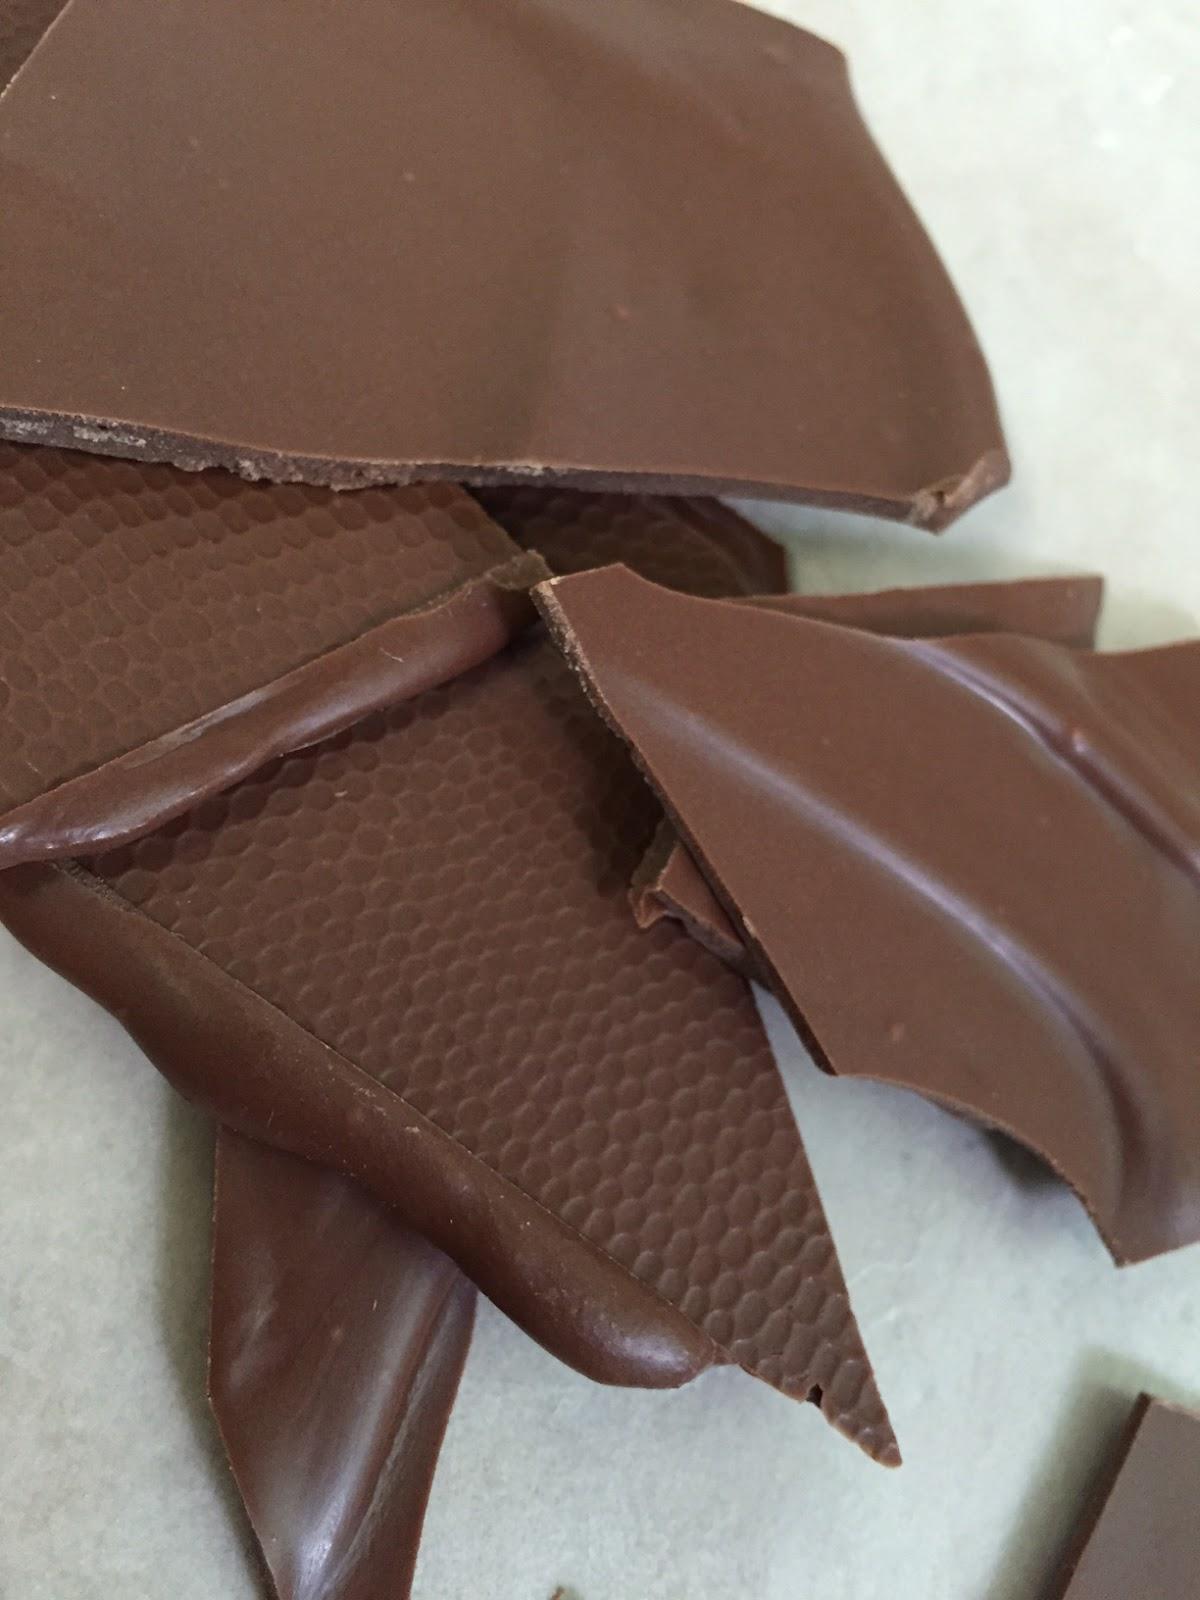 The Ultimate Chocolate Blog: DIY Chocolate: No Milk Chocolate On